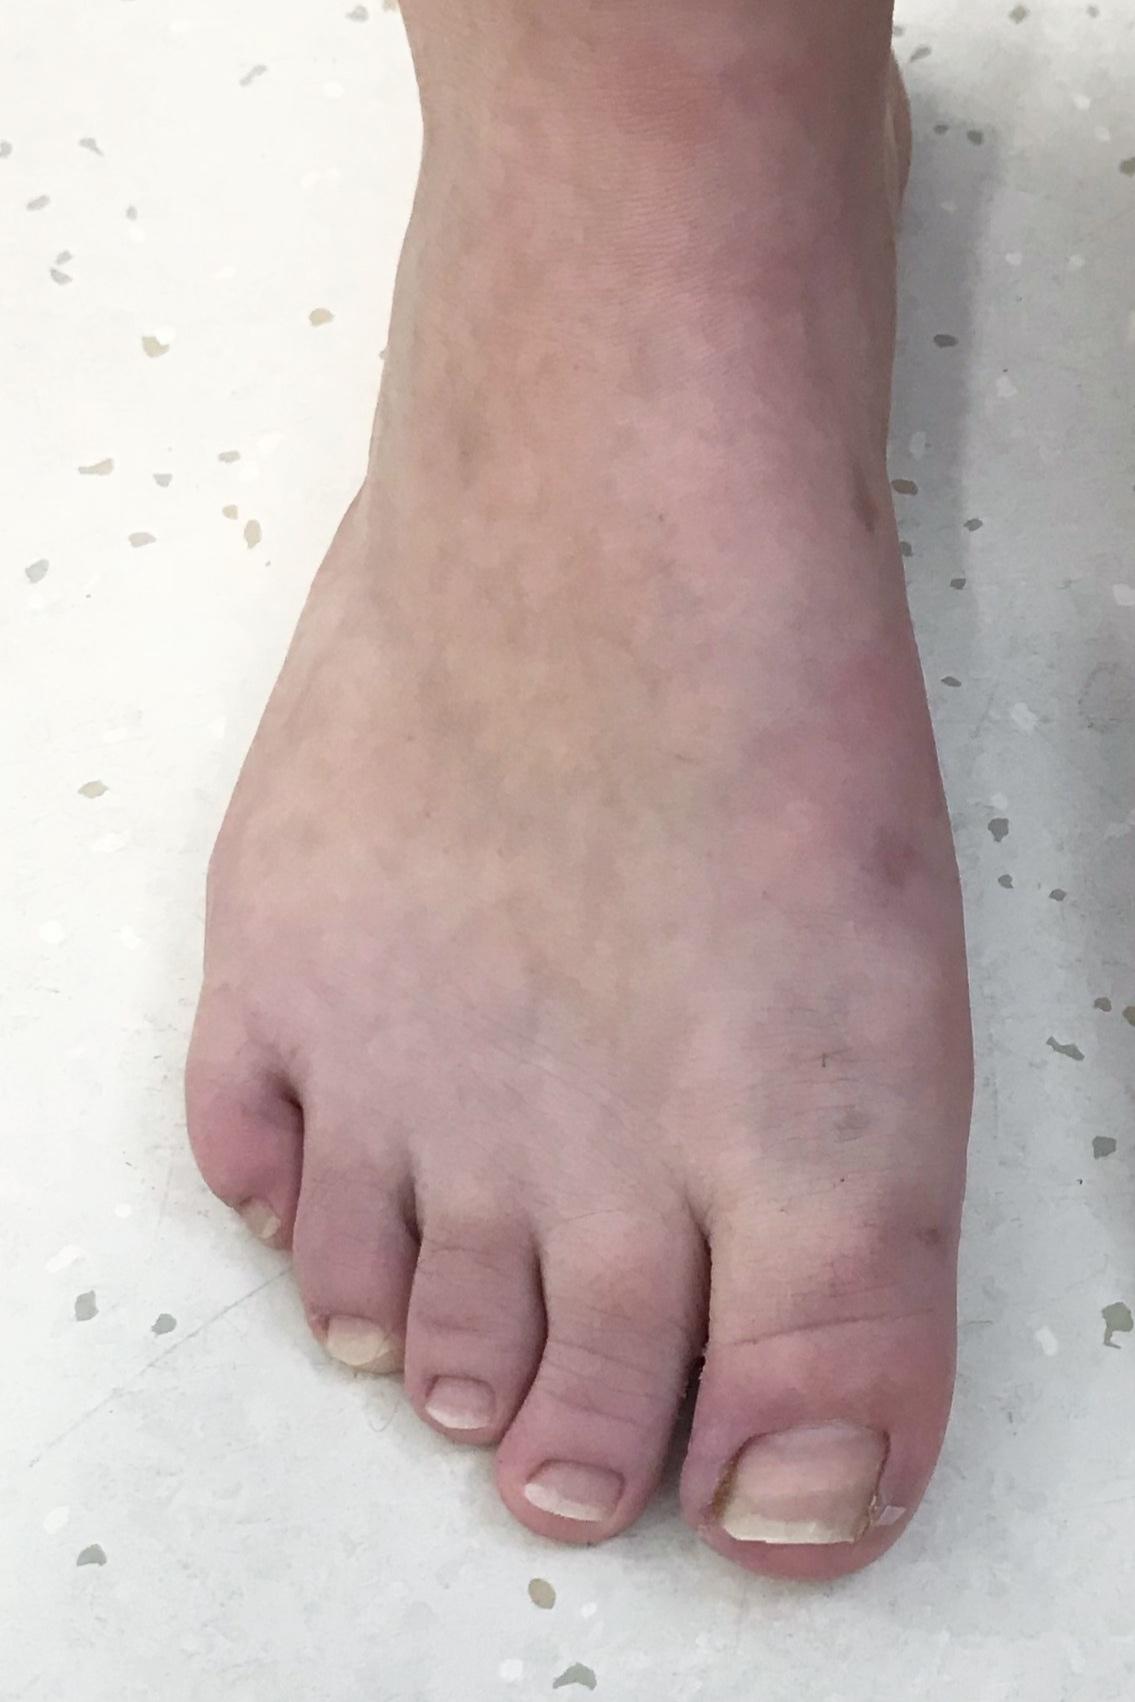 Case 11:  Six months after MICA (ProStep) surgery